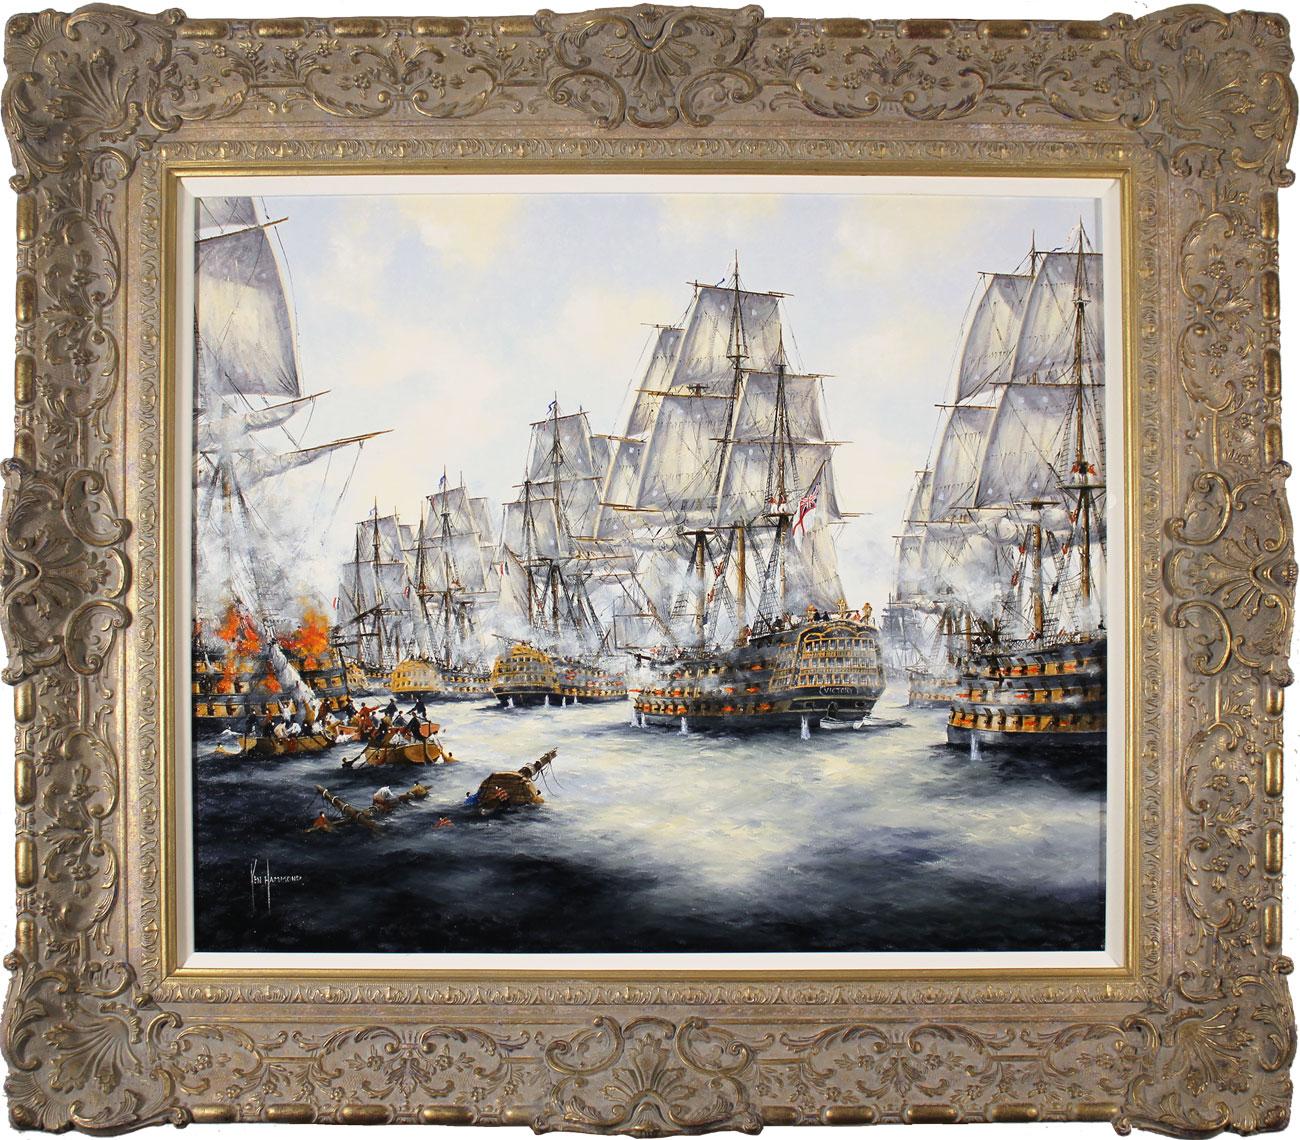 Ken Hammond, Original oil painting on panel, Battle of Trafalgar, 1805, click to enlarge